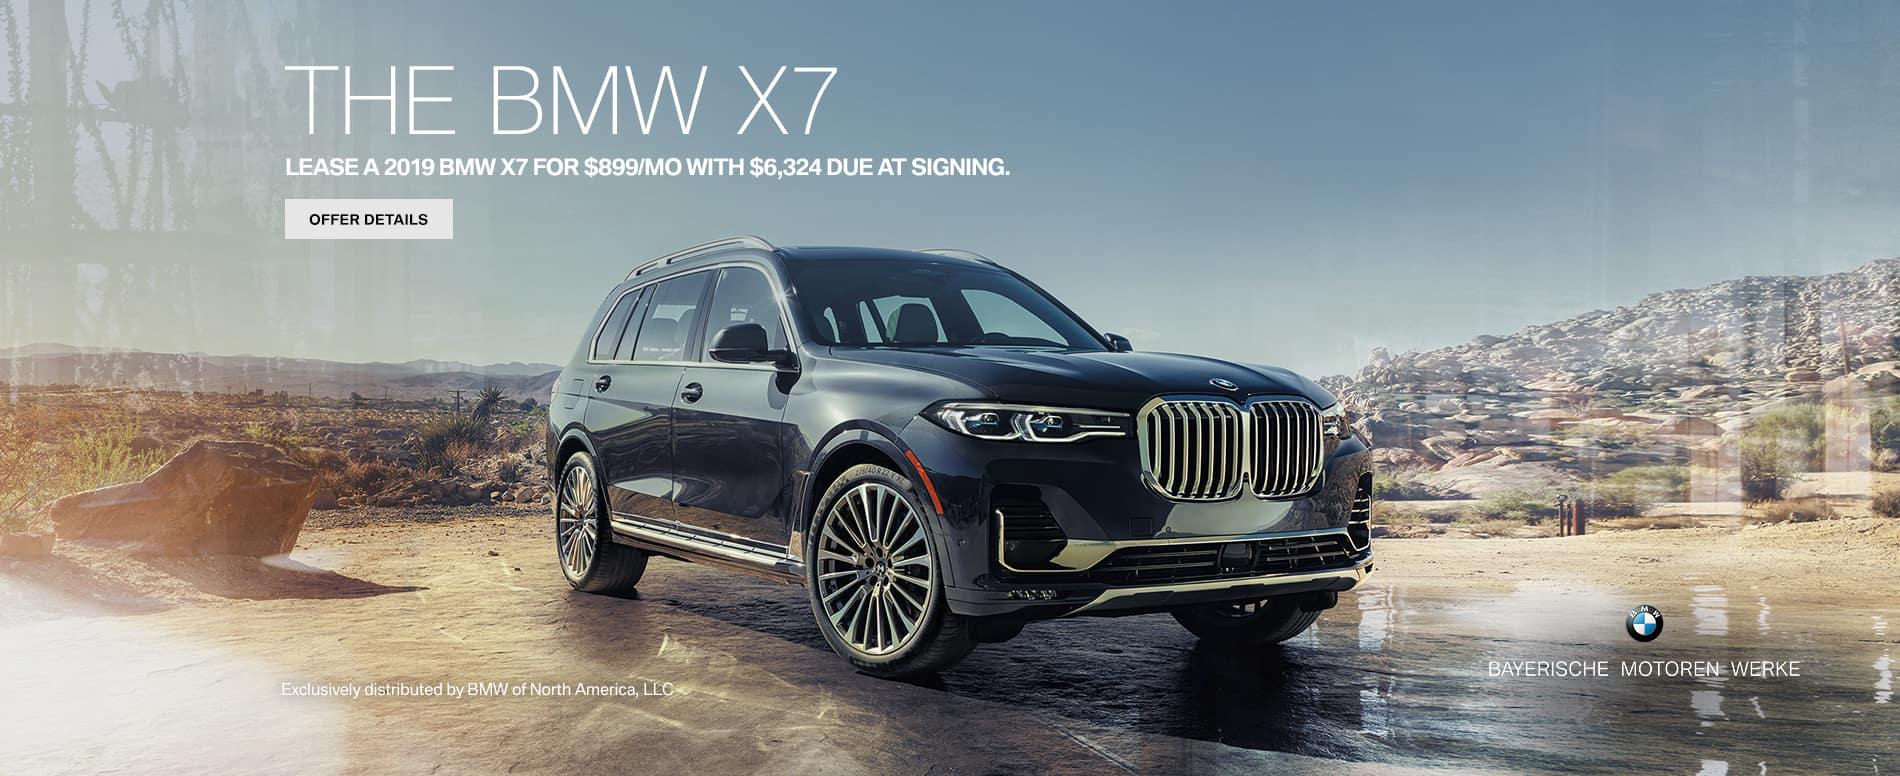 AUGUST_PUSH_2019_BMW_X7_899